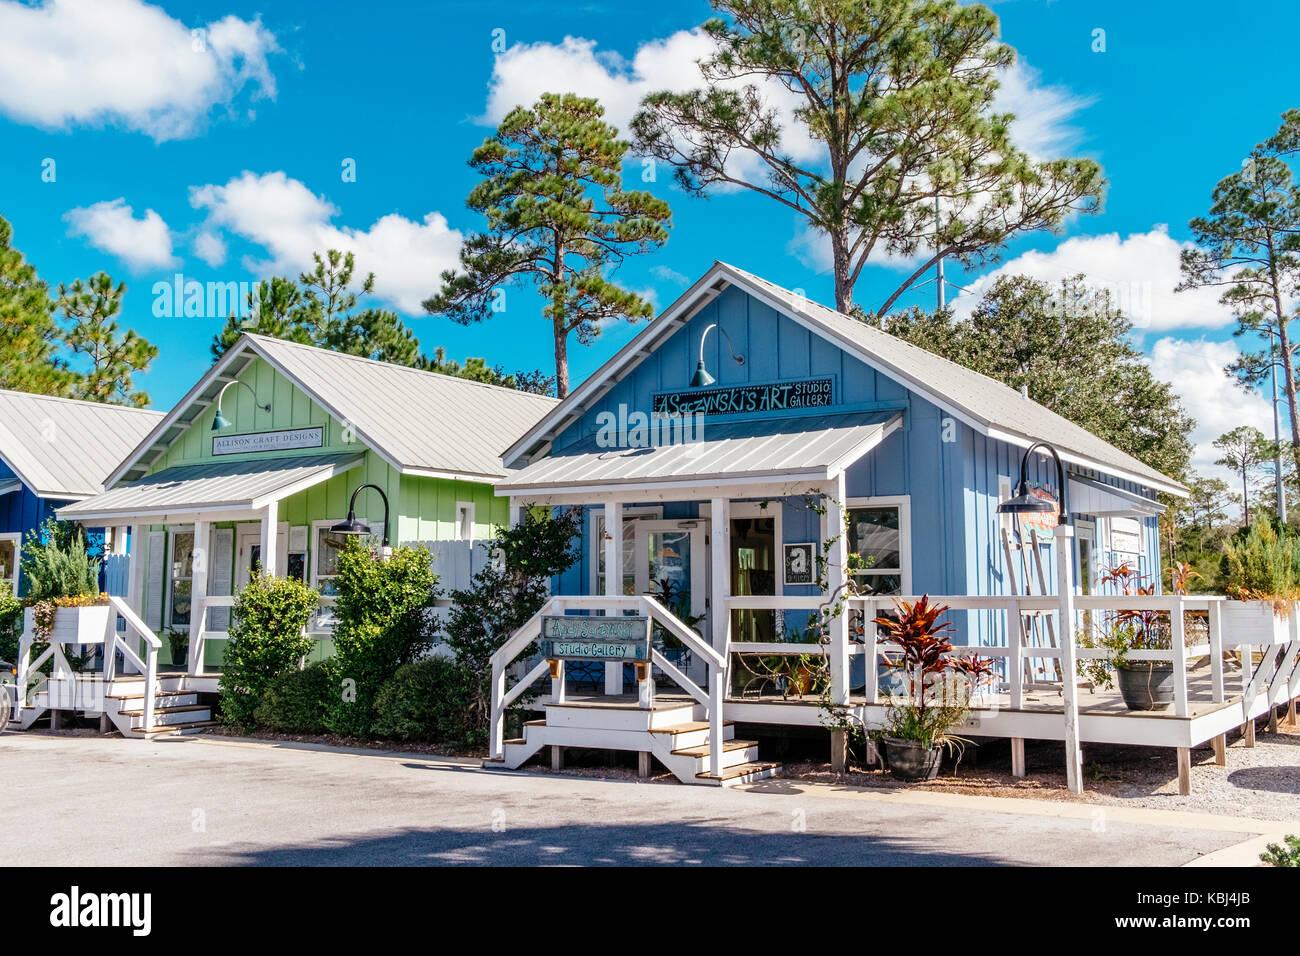 small-colorful-shops-near-grayton-beach-